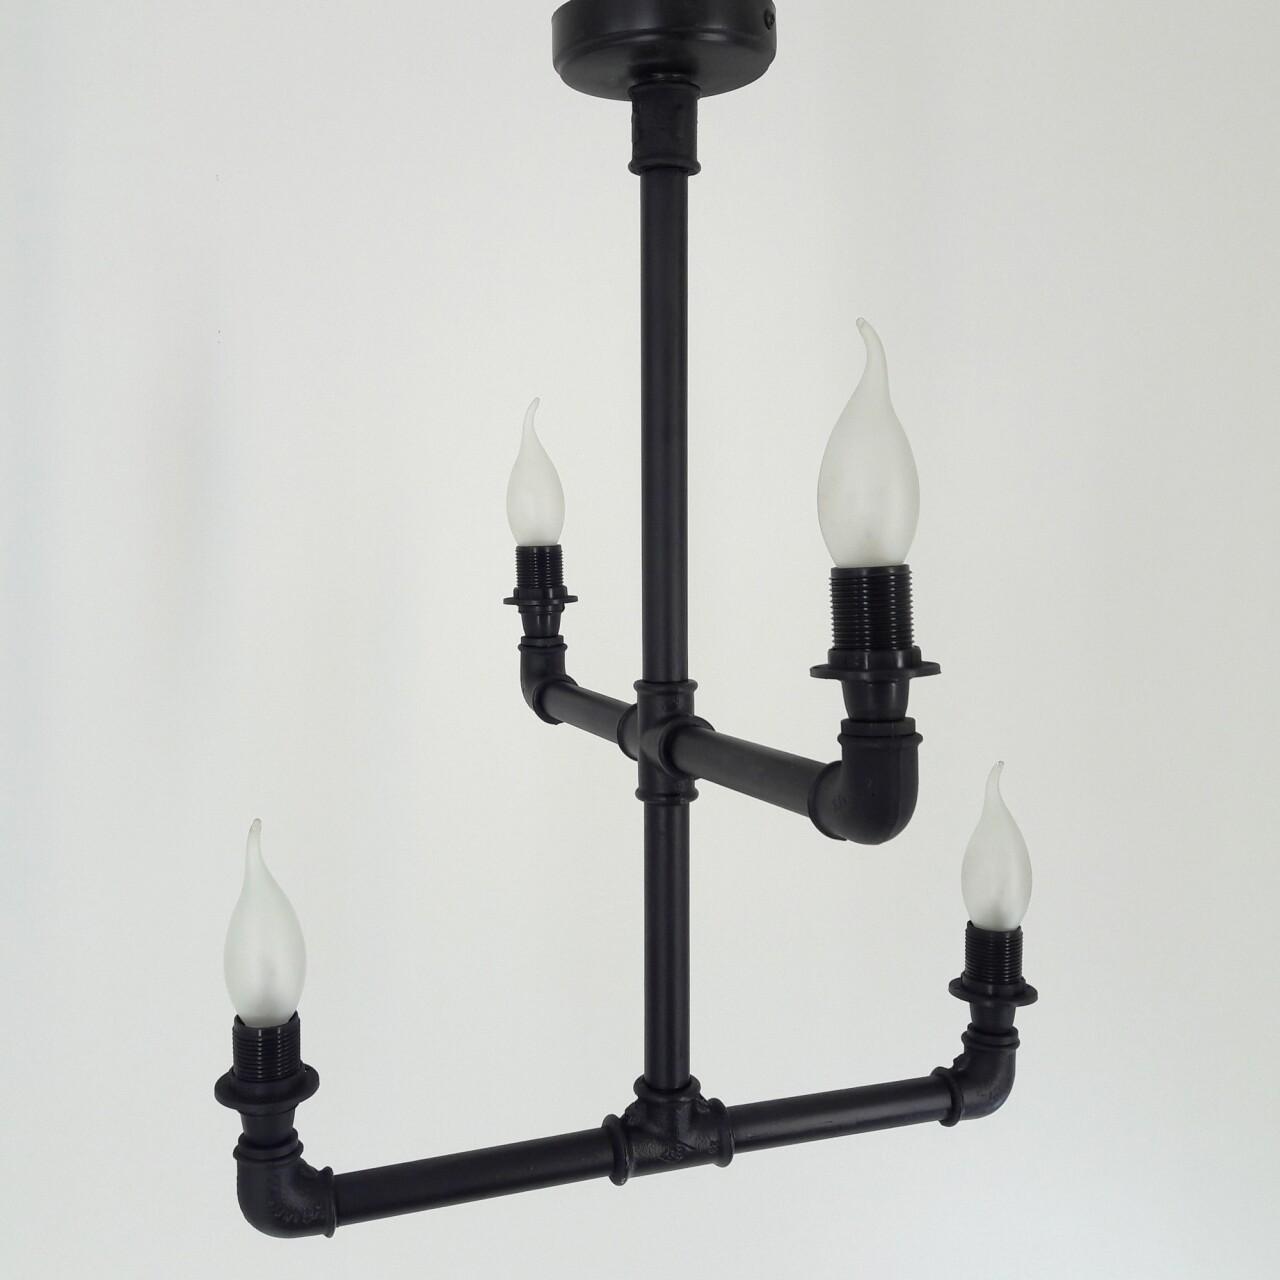 Candelabru All Design, metal, 55x40x40 cm, Black